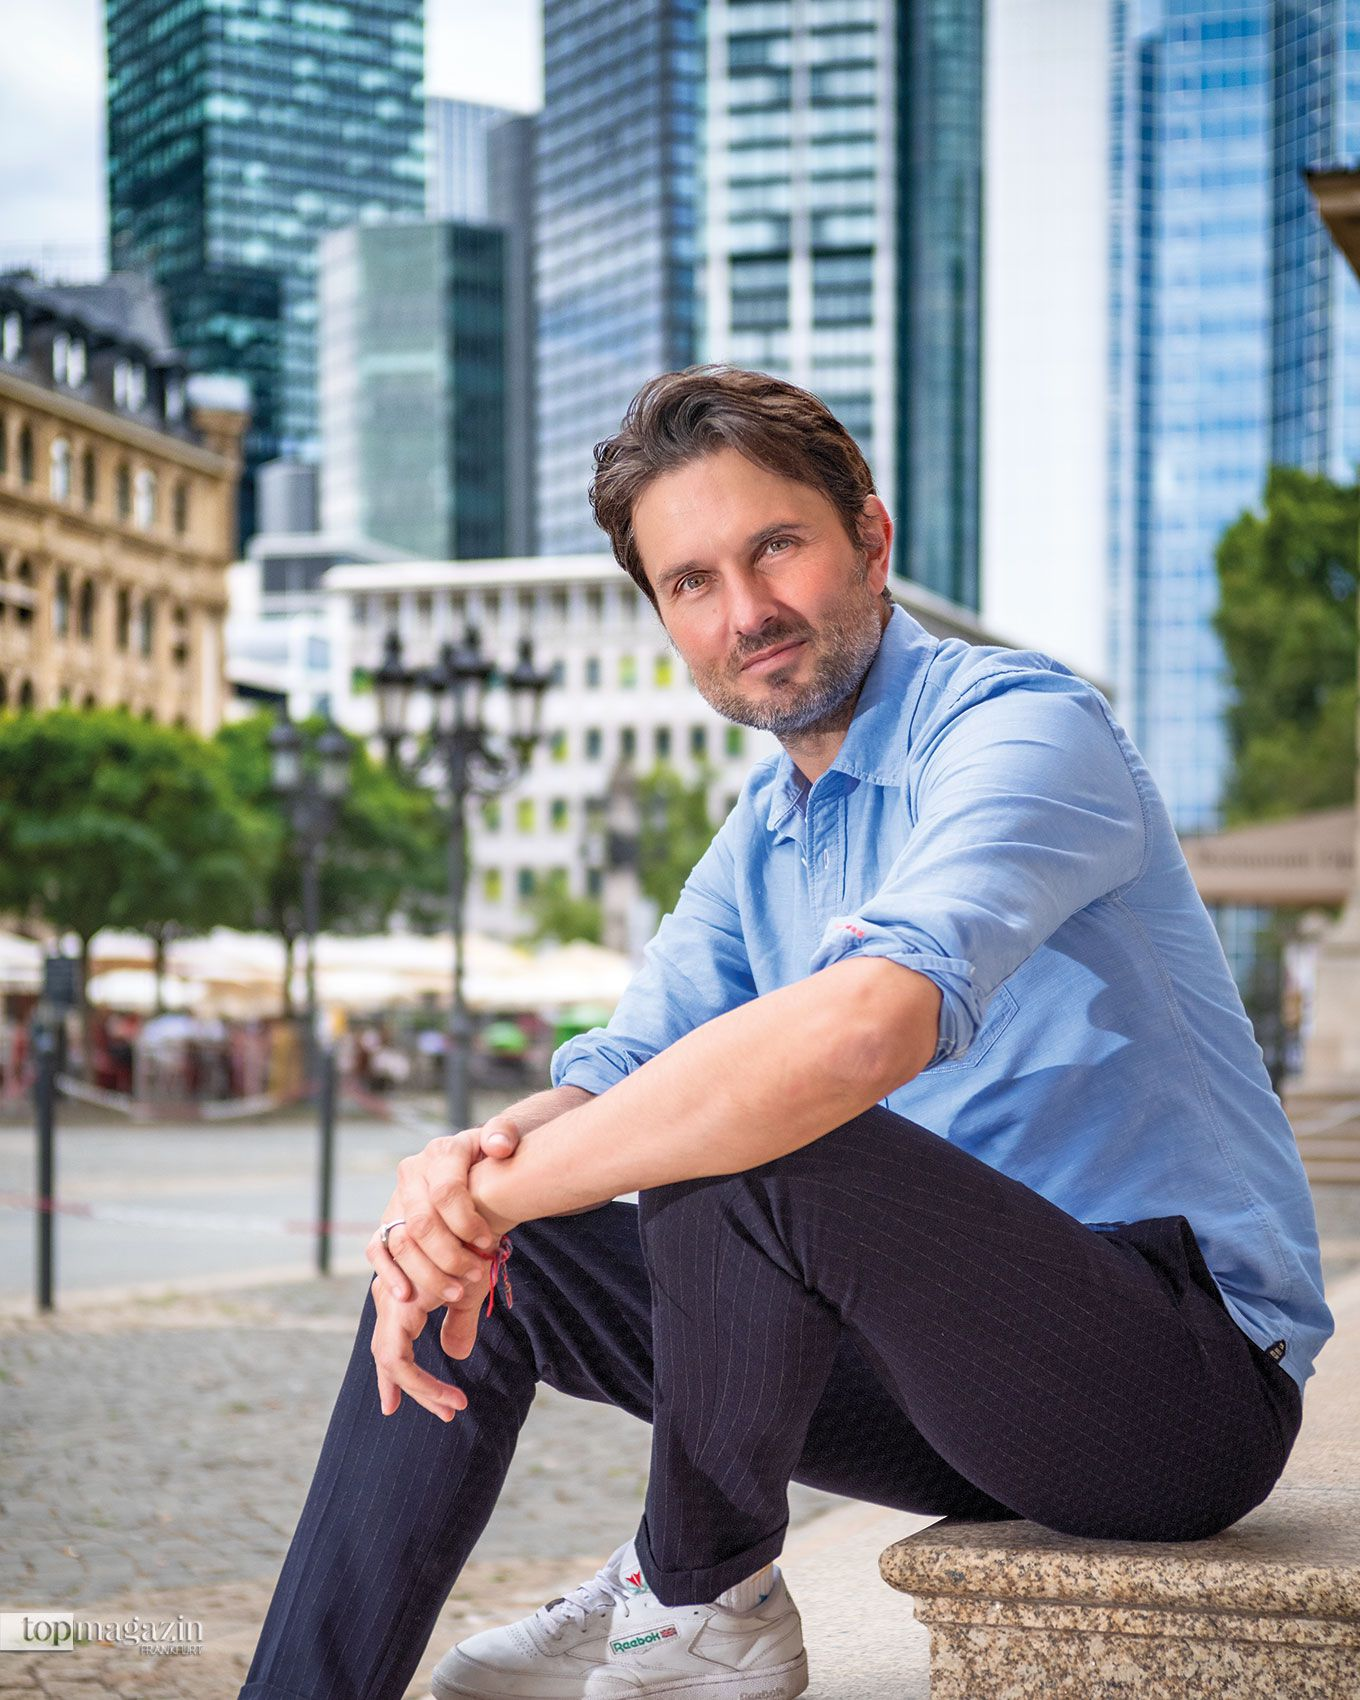 Simon Verhoeven am Opernplatz in Frankfurt